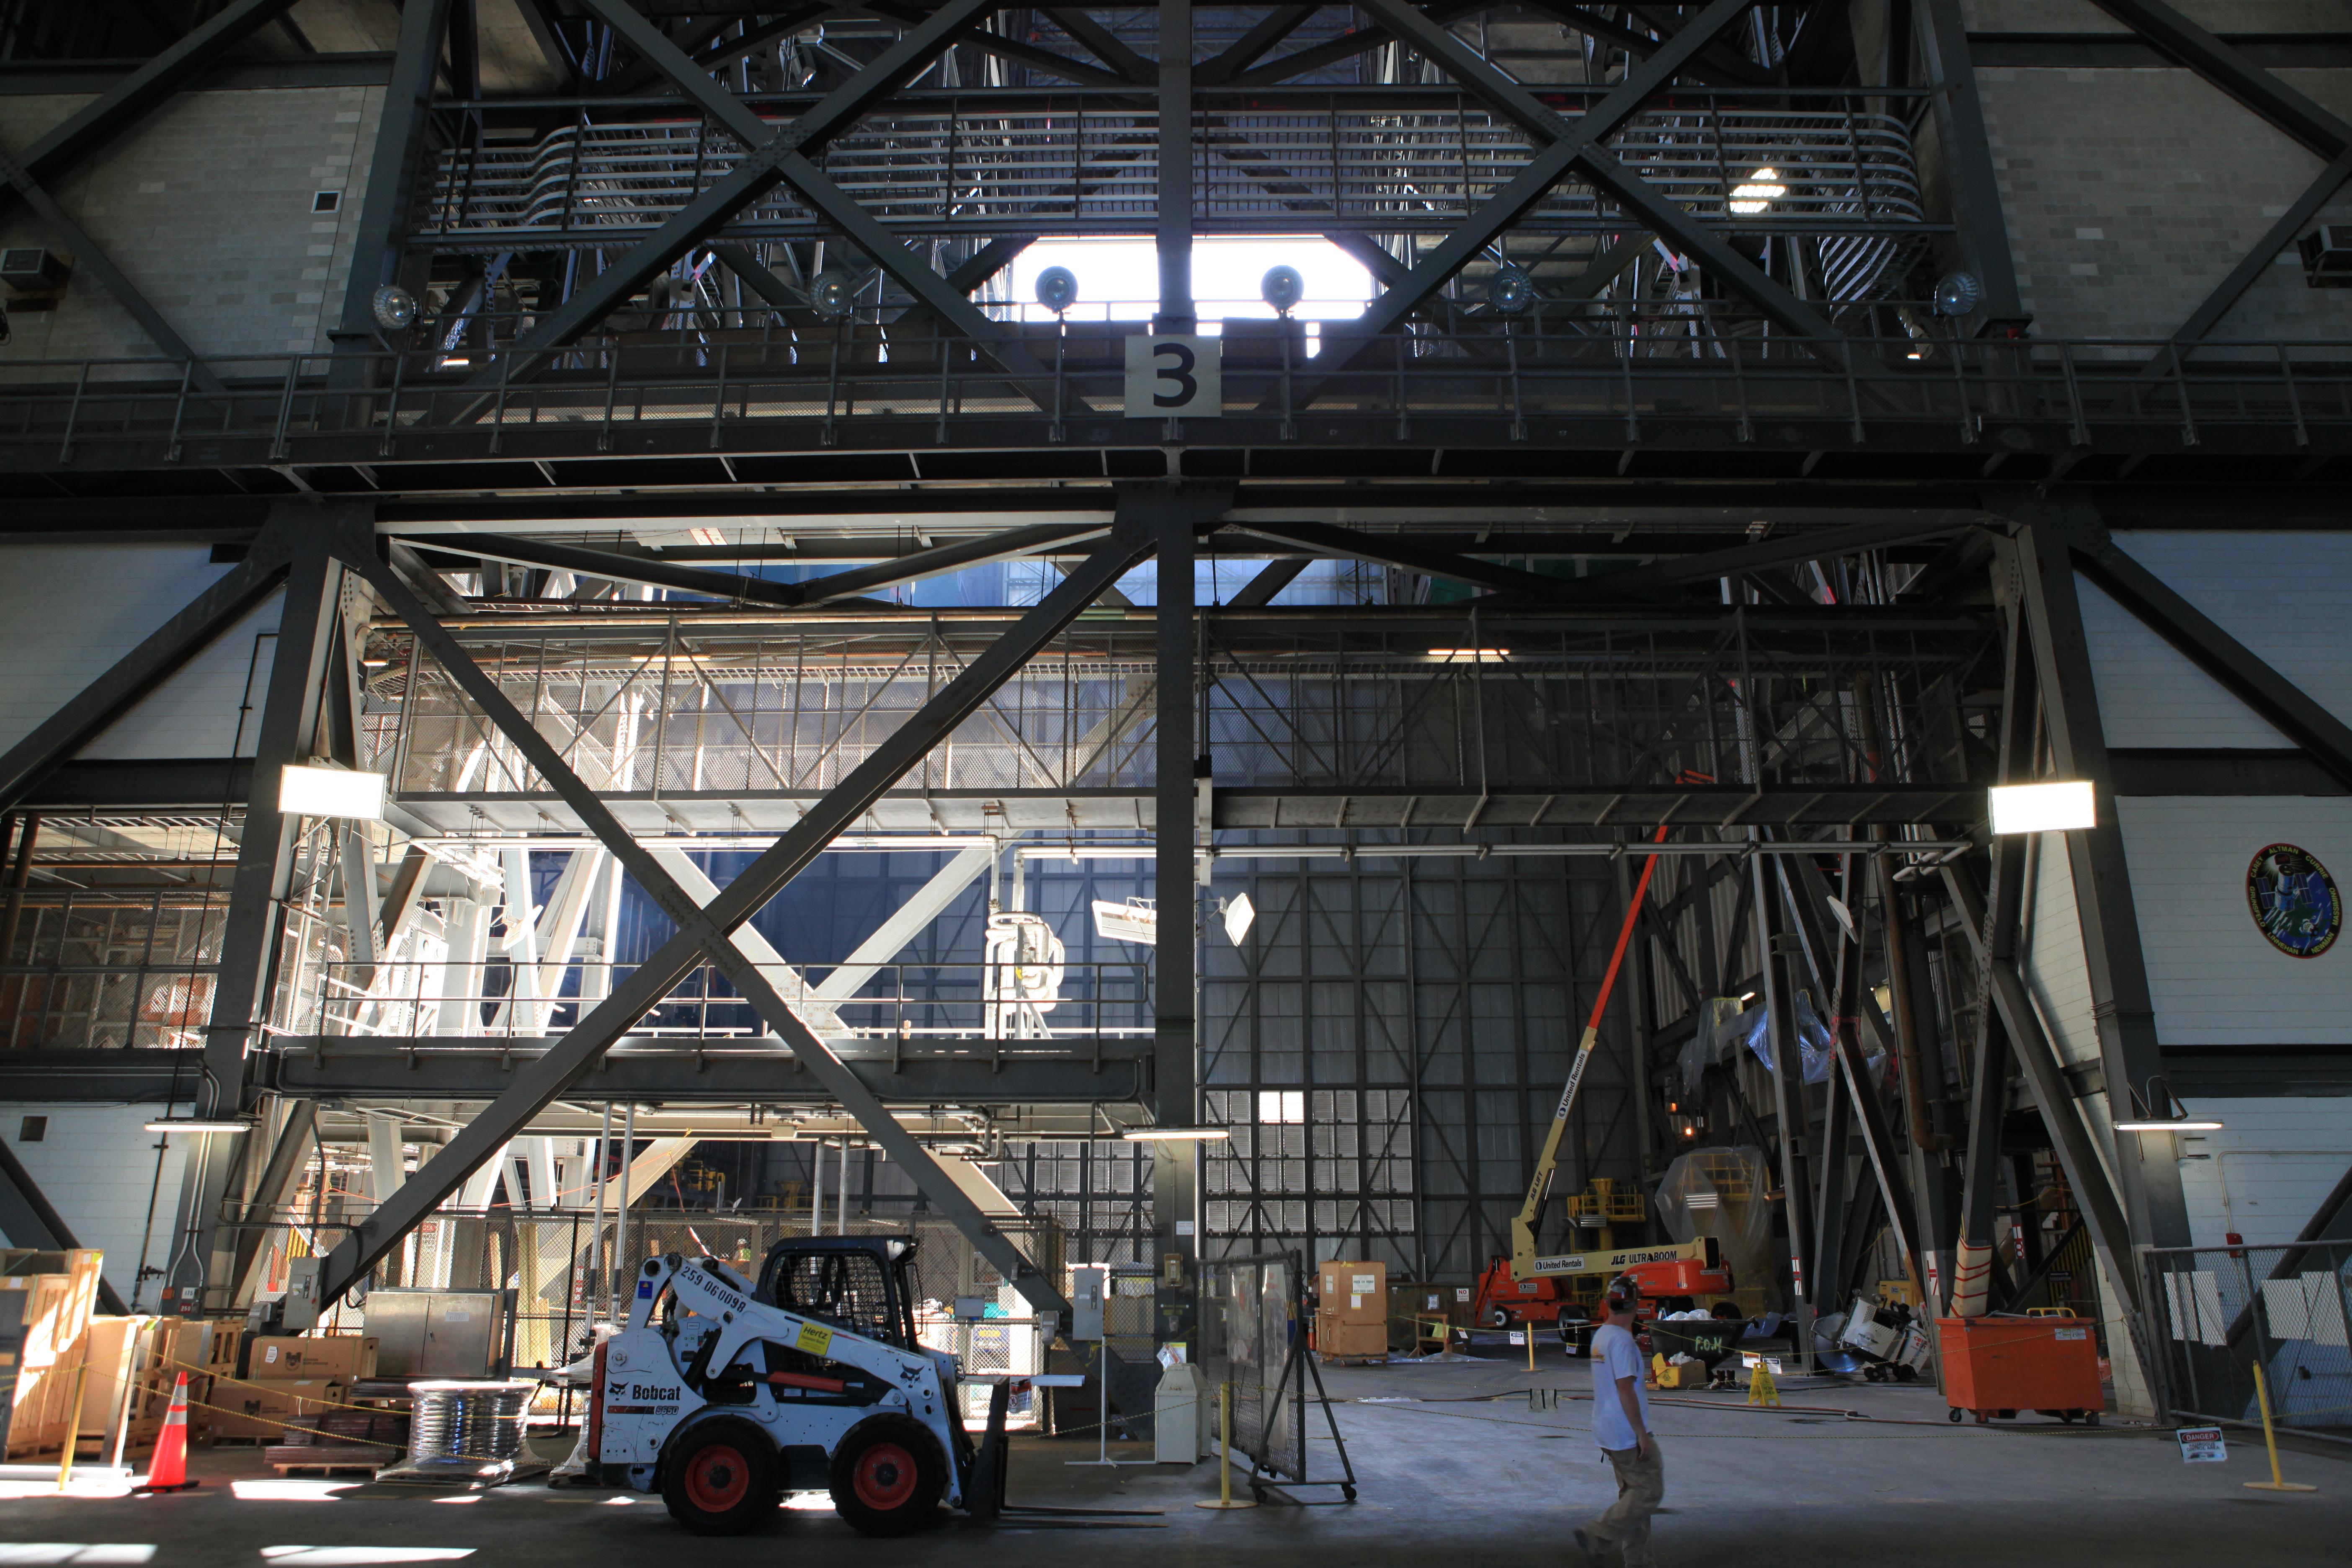 nasa vehicle assembly building interior - photo #38